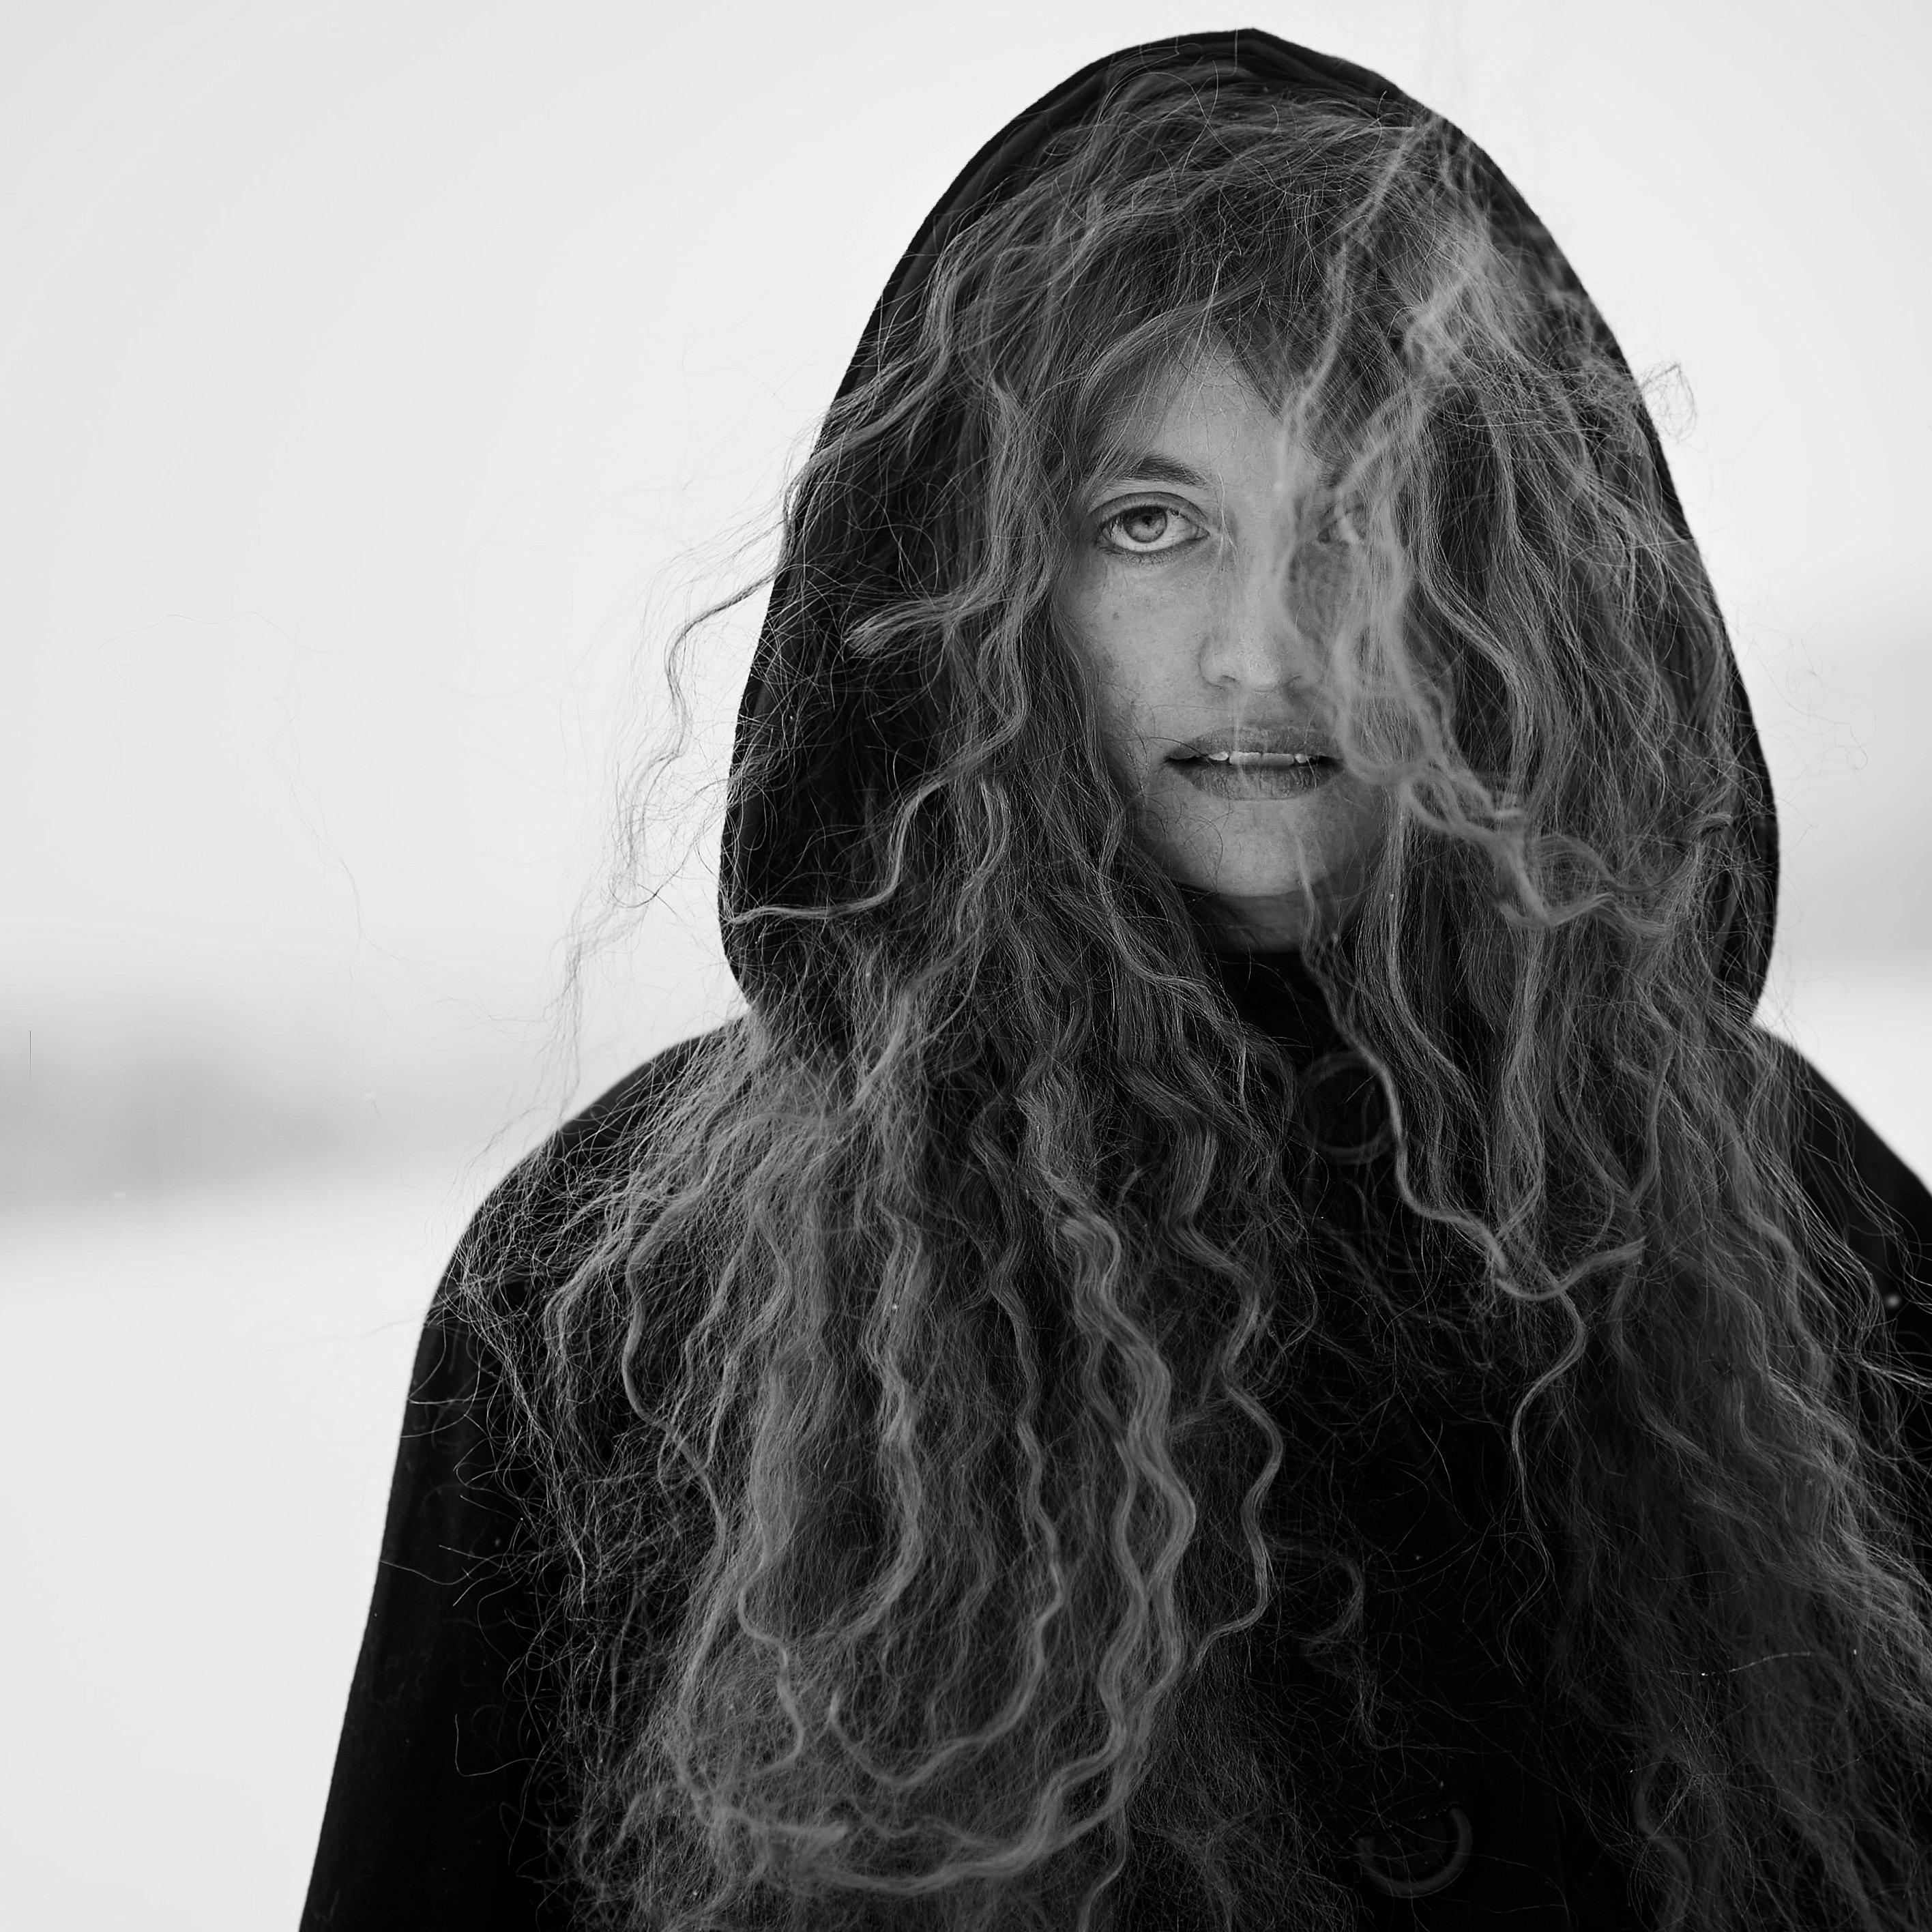 woman, eye, eyes, witch, wizard, winter, cold, snow, wind, hair, long hair, black&whitw, b&w, bw, Соломатина Екатерина